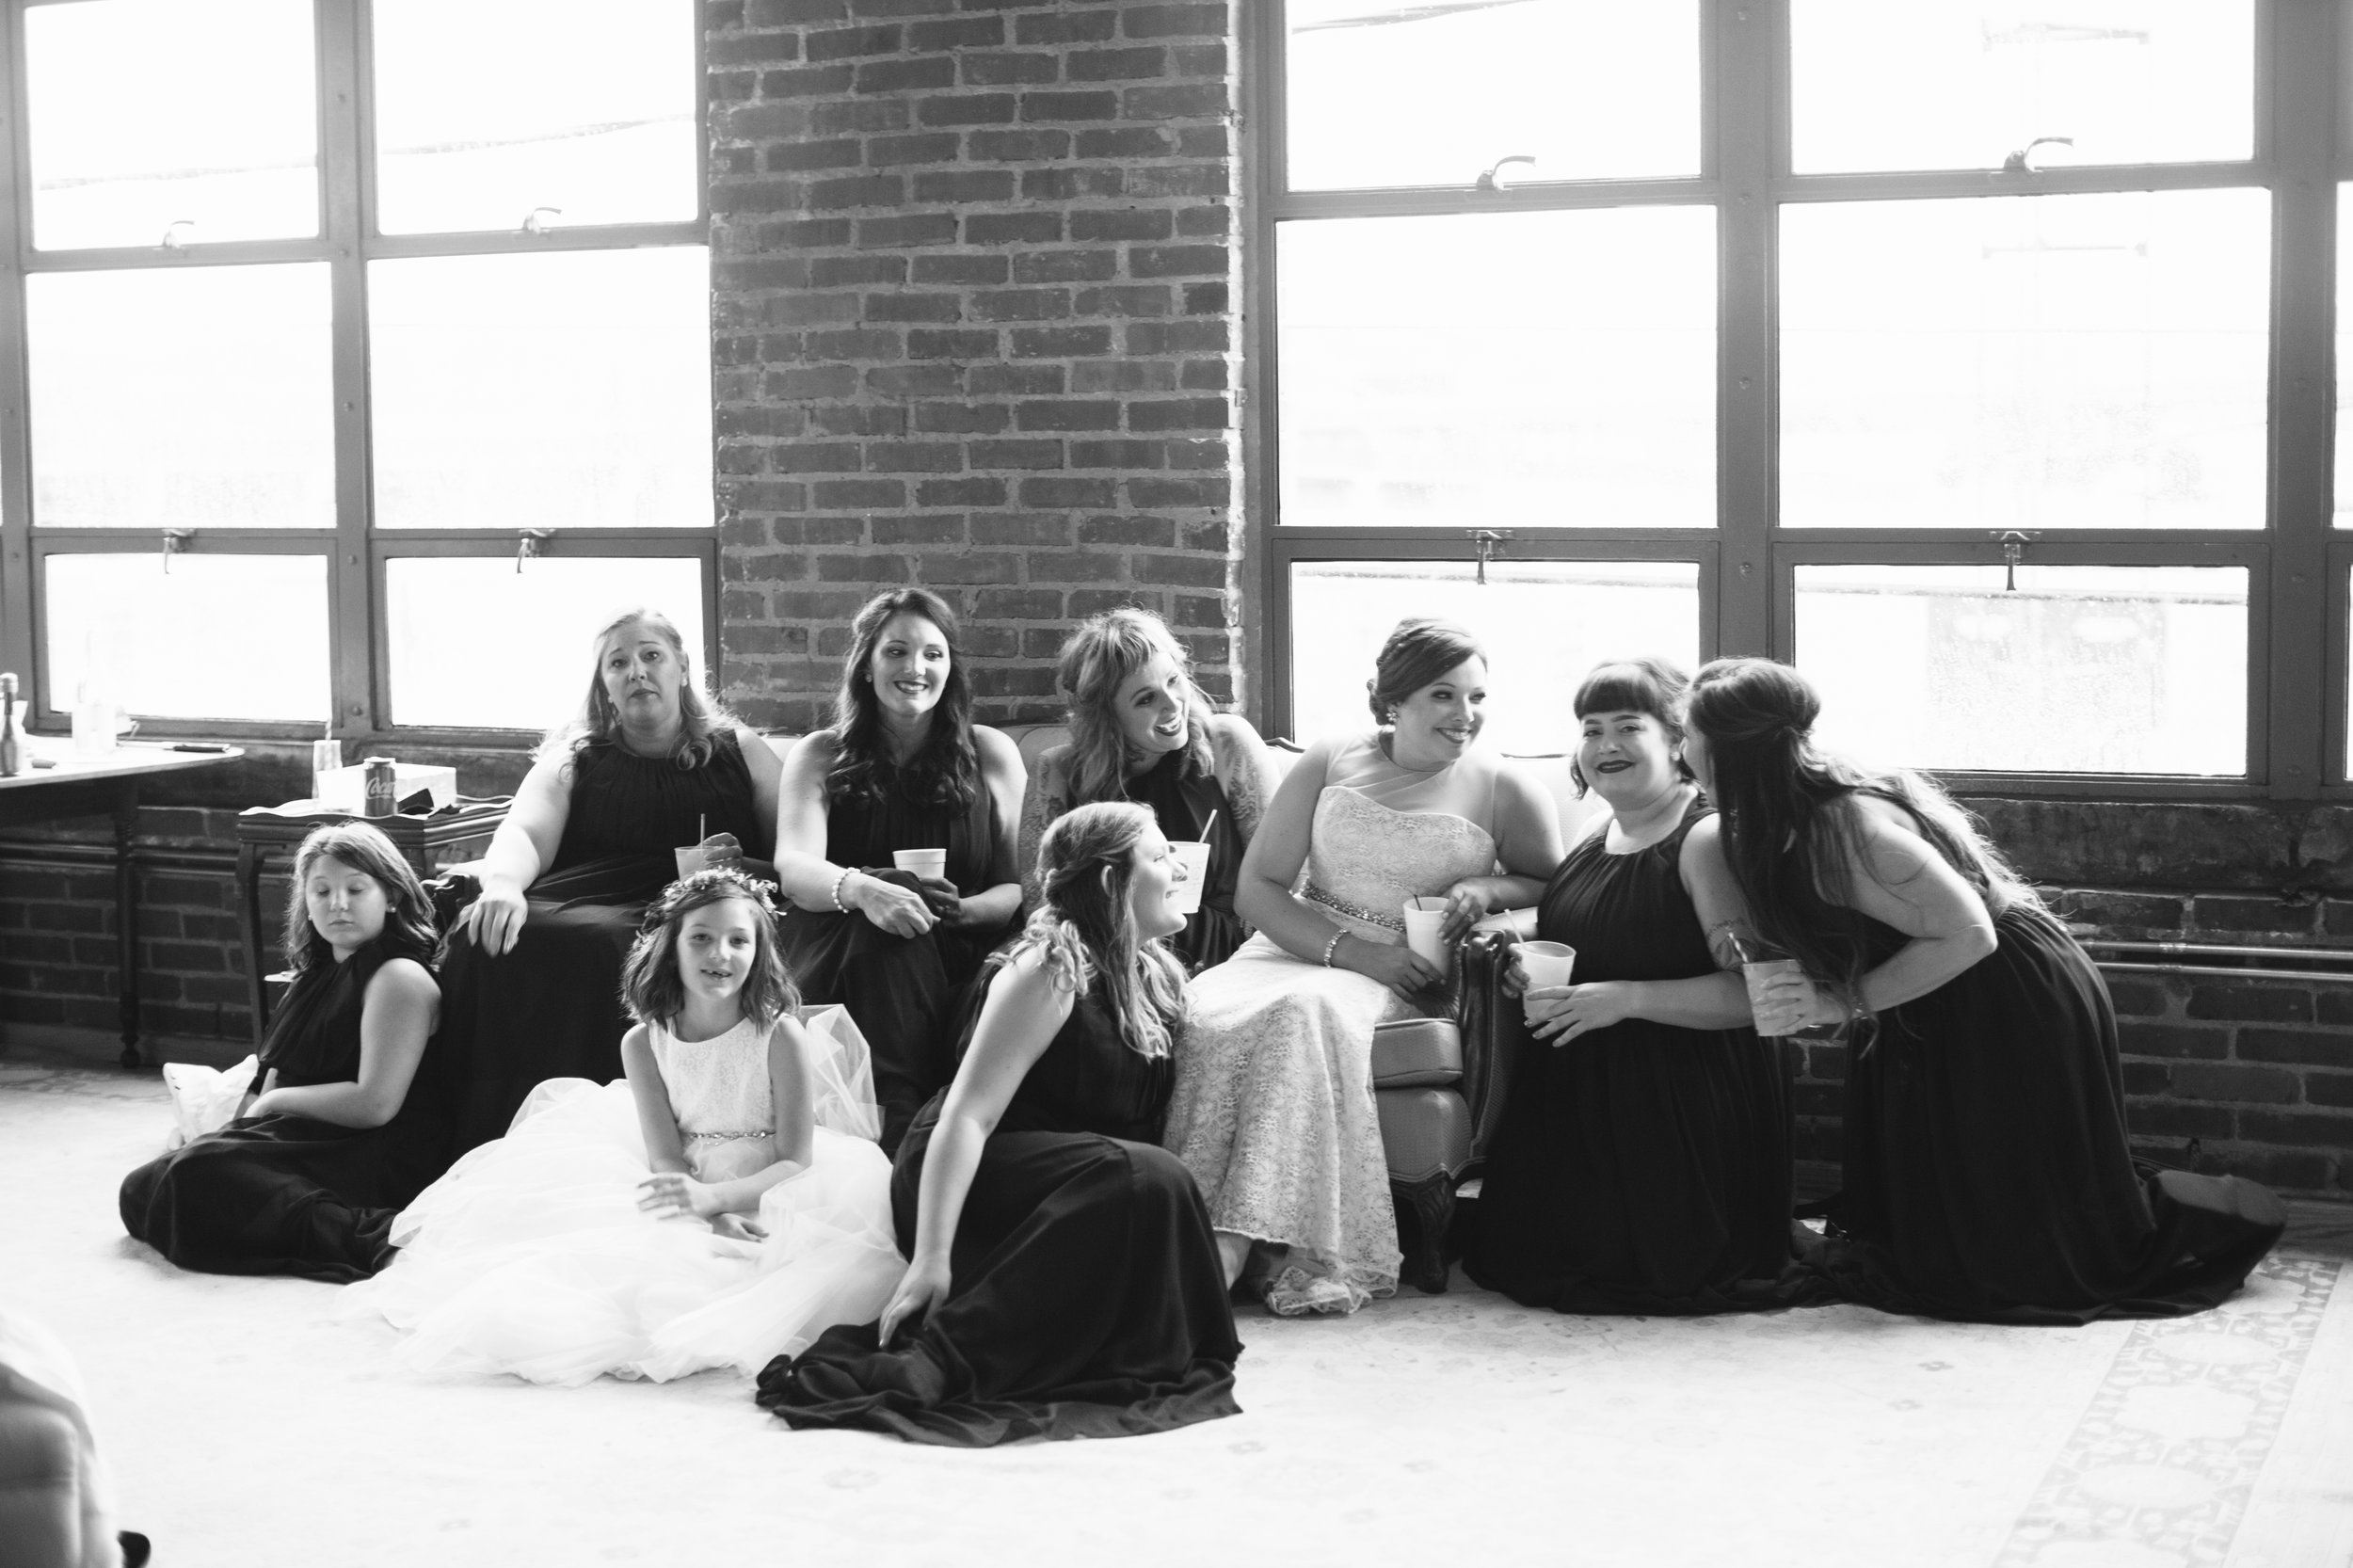 Jessica_Bryan_Wedding_Standard_Knoxville_Abigail_Malone_Photography-490.jpg